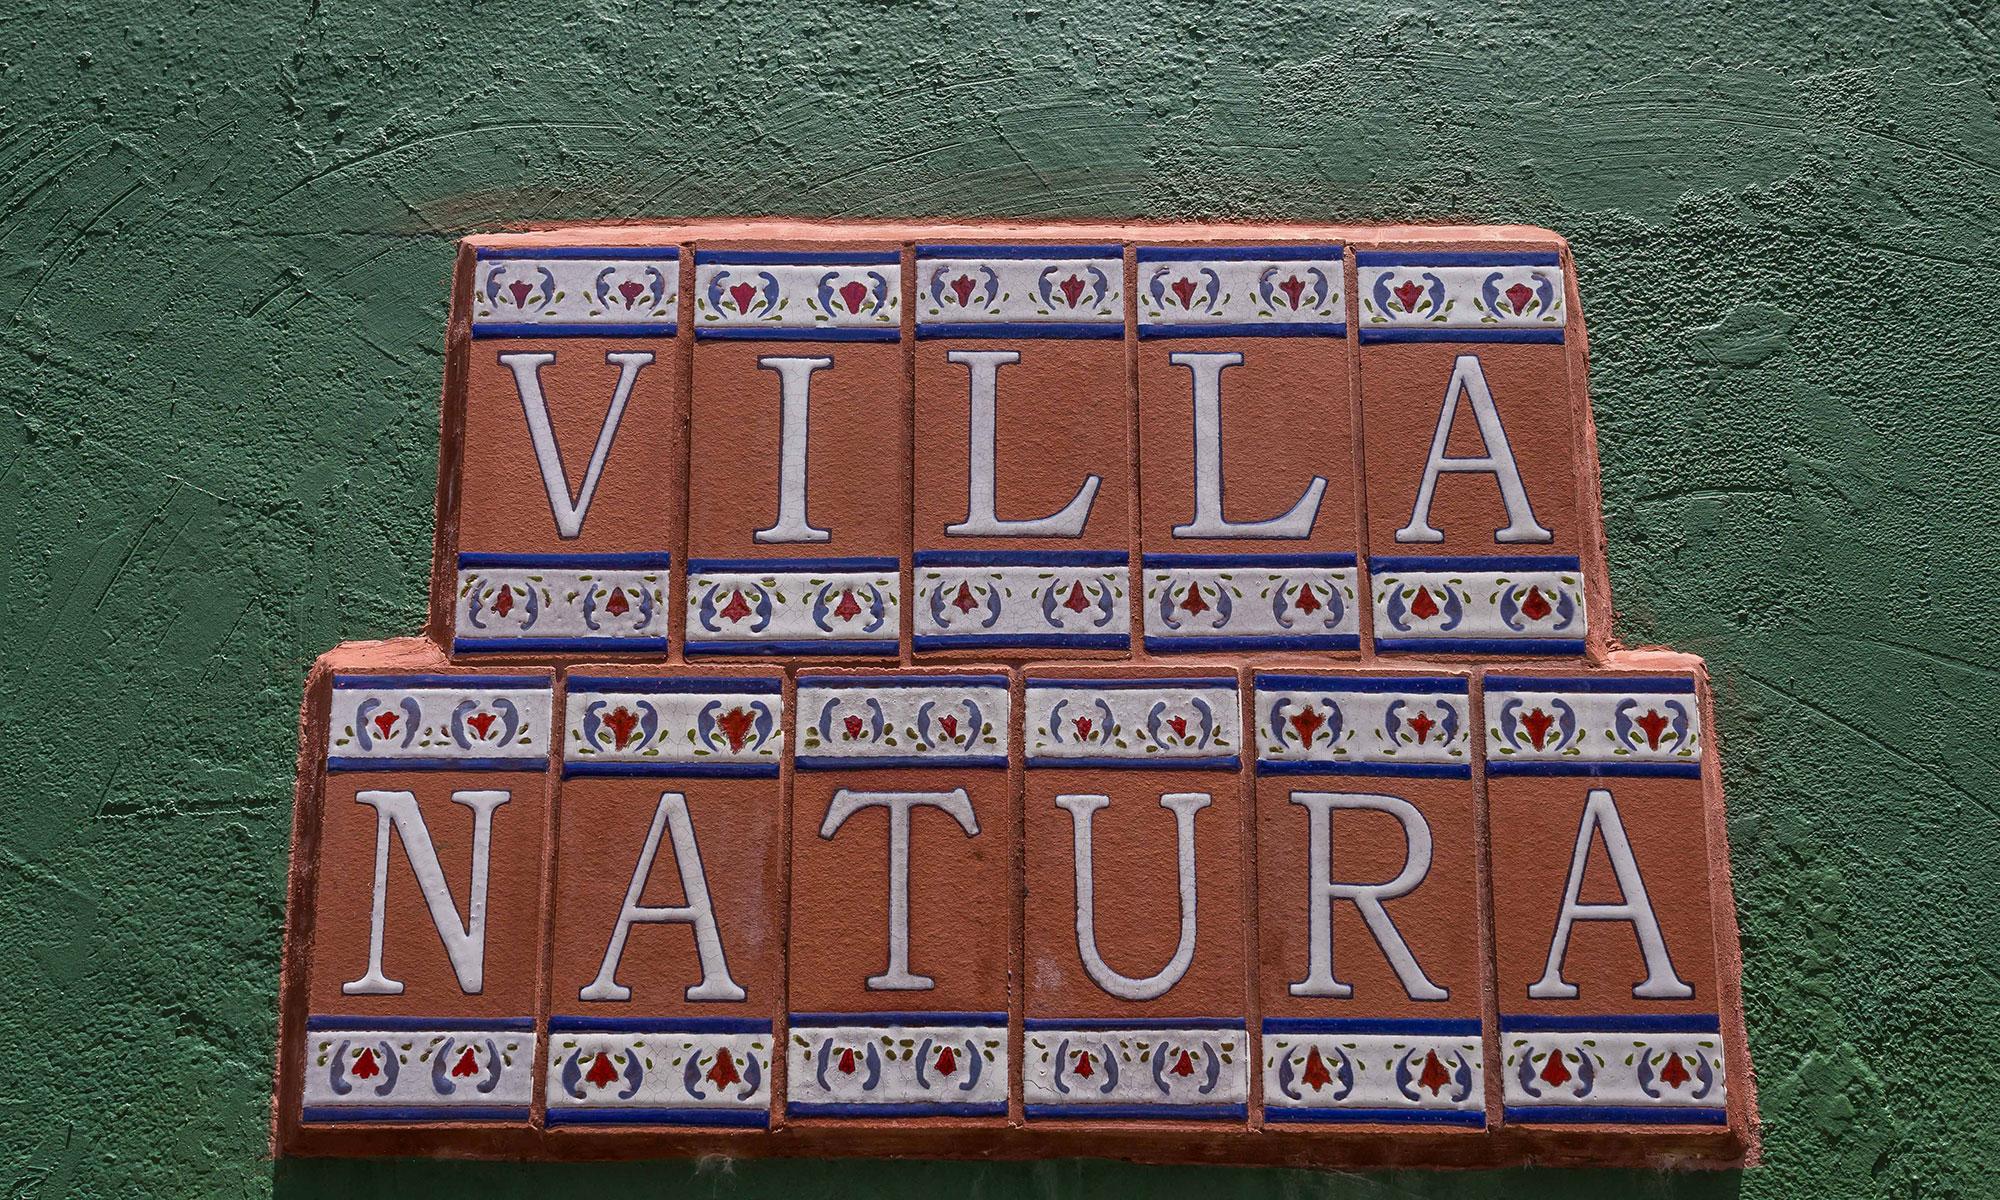 Villa Natura sign